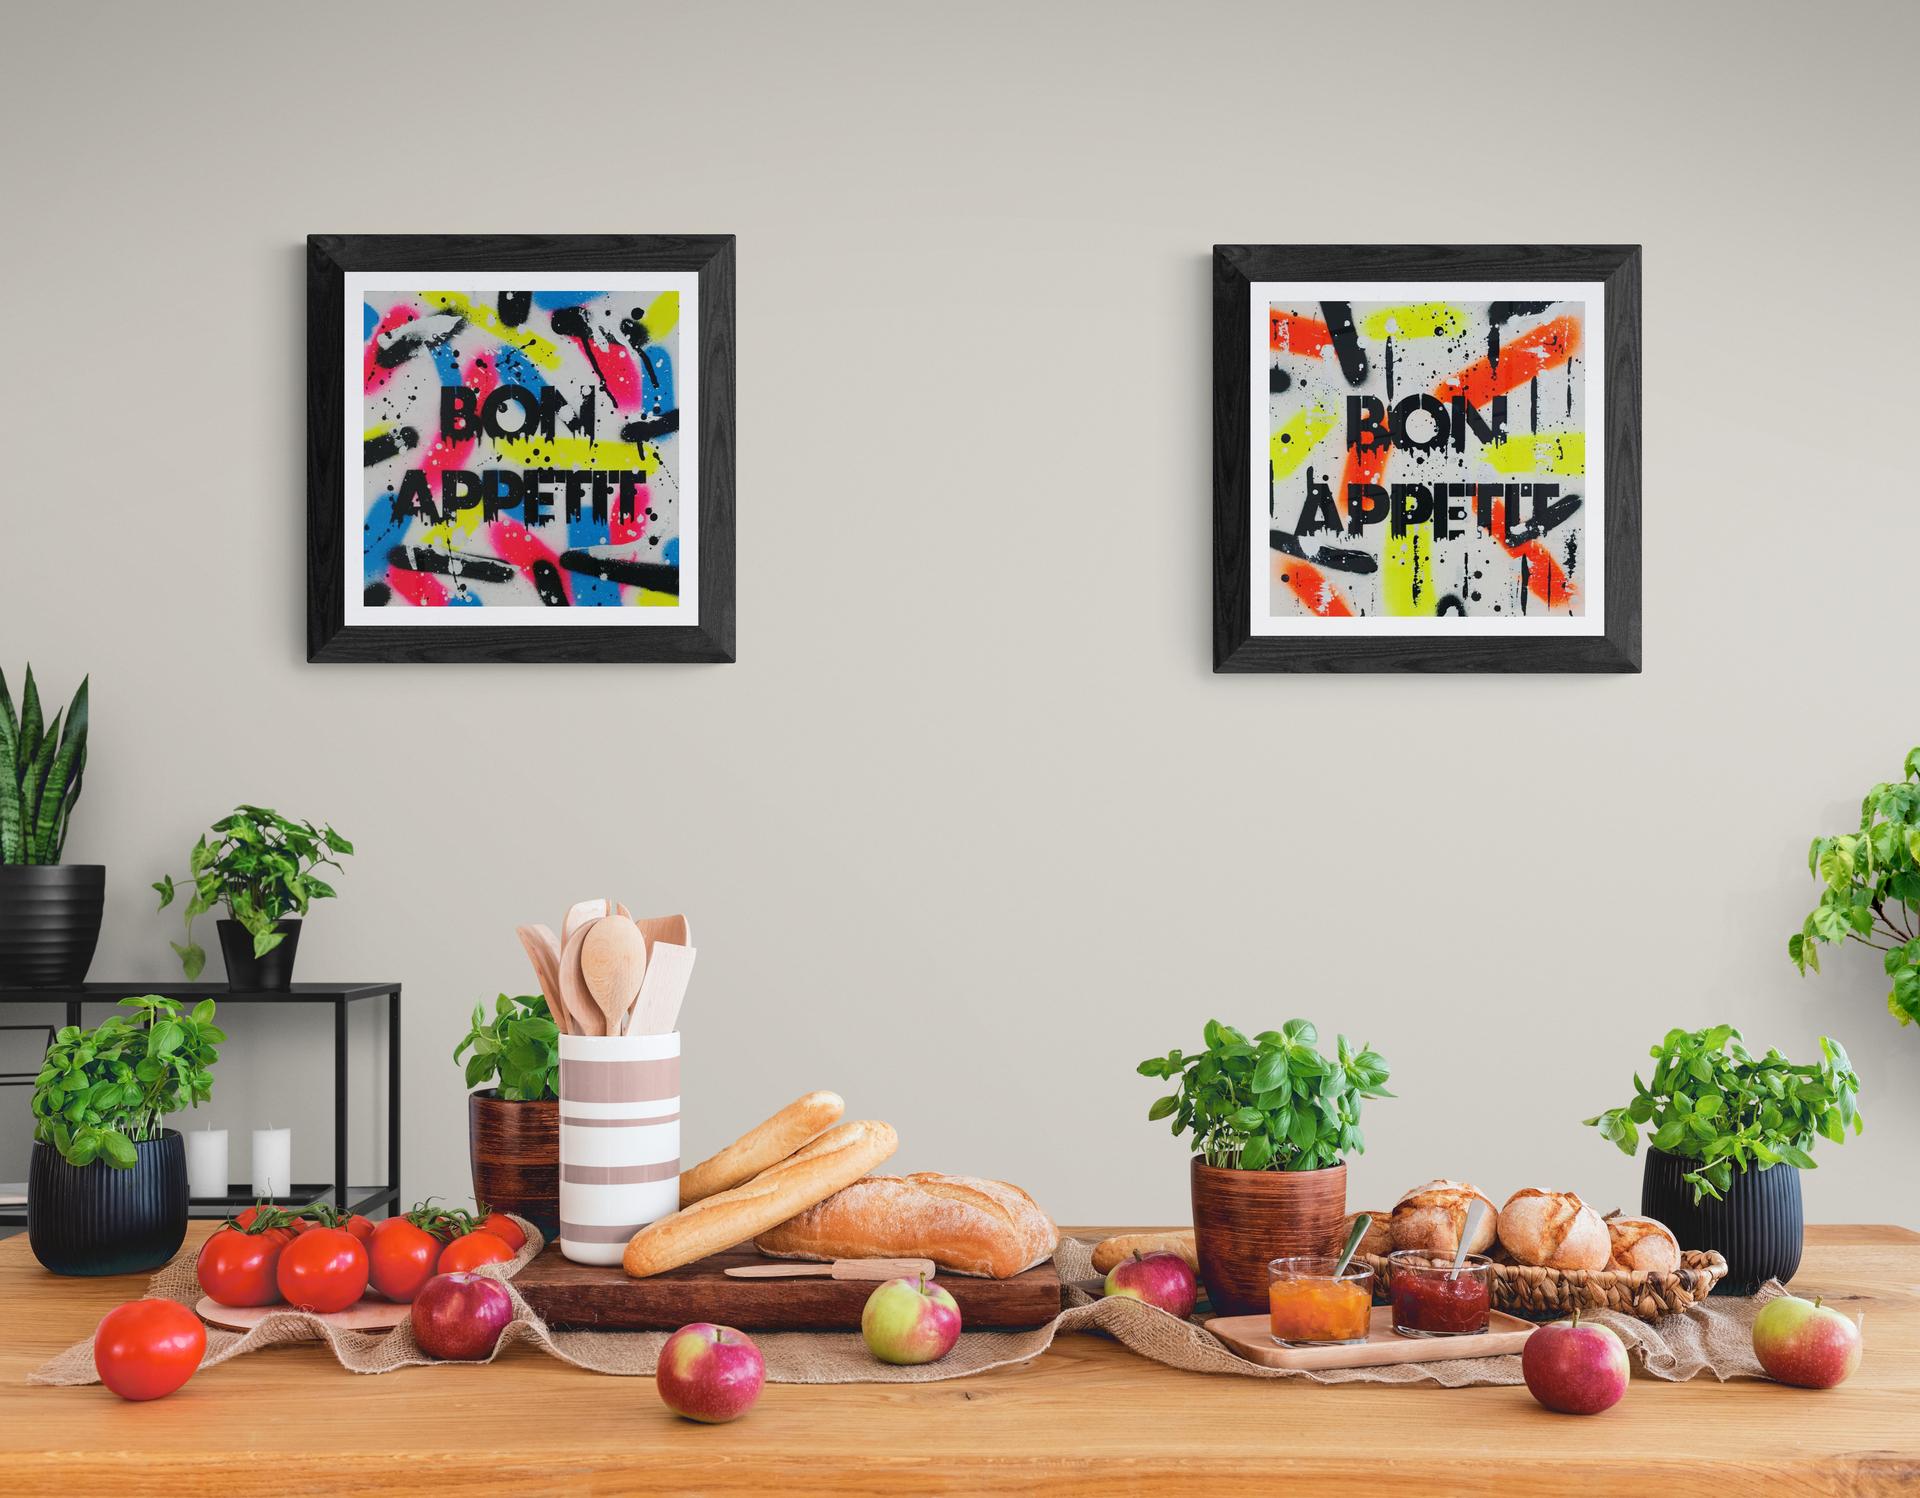 Bon Appétit - Spray Paint Canvas